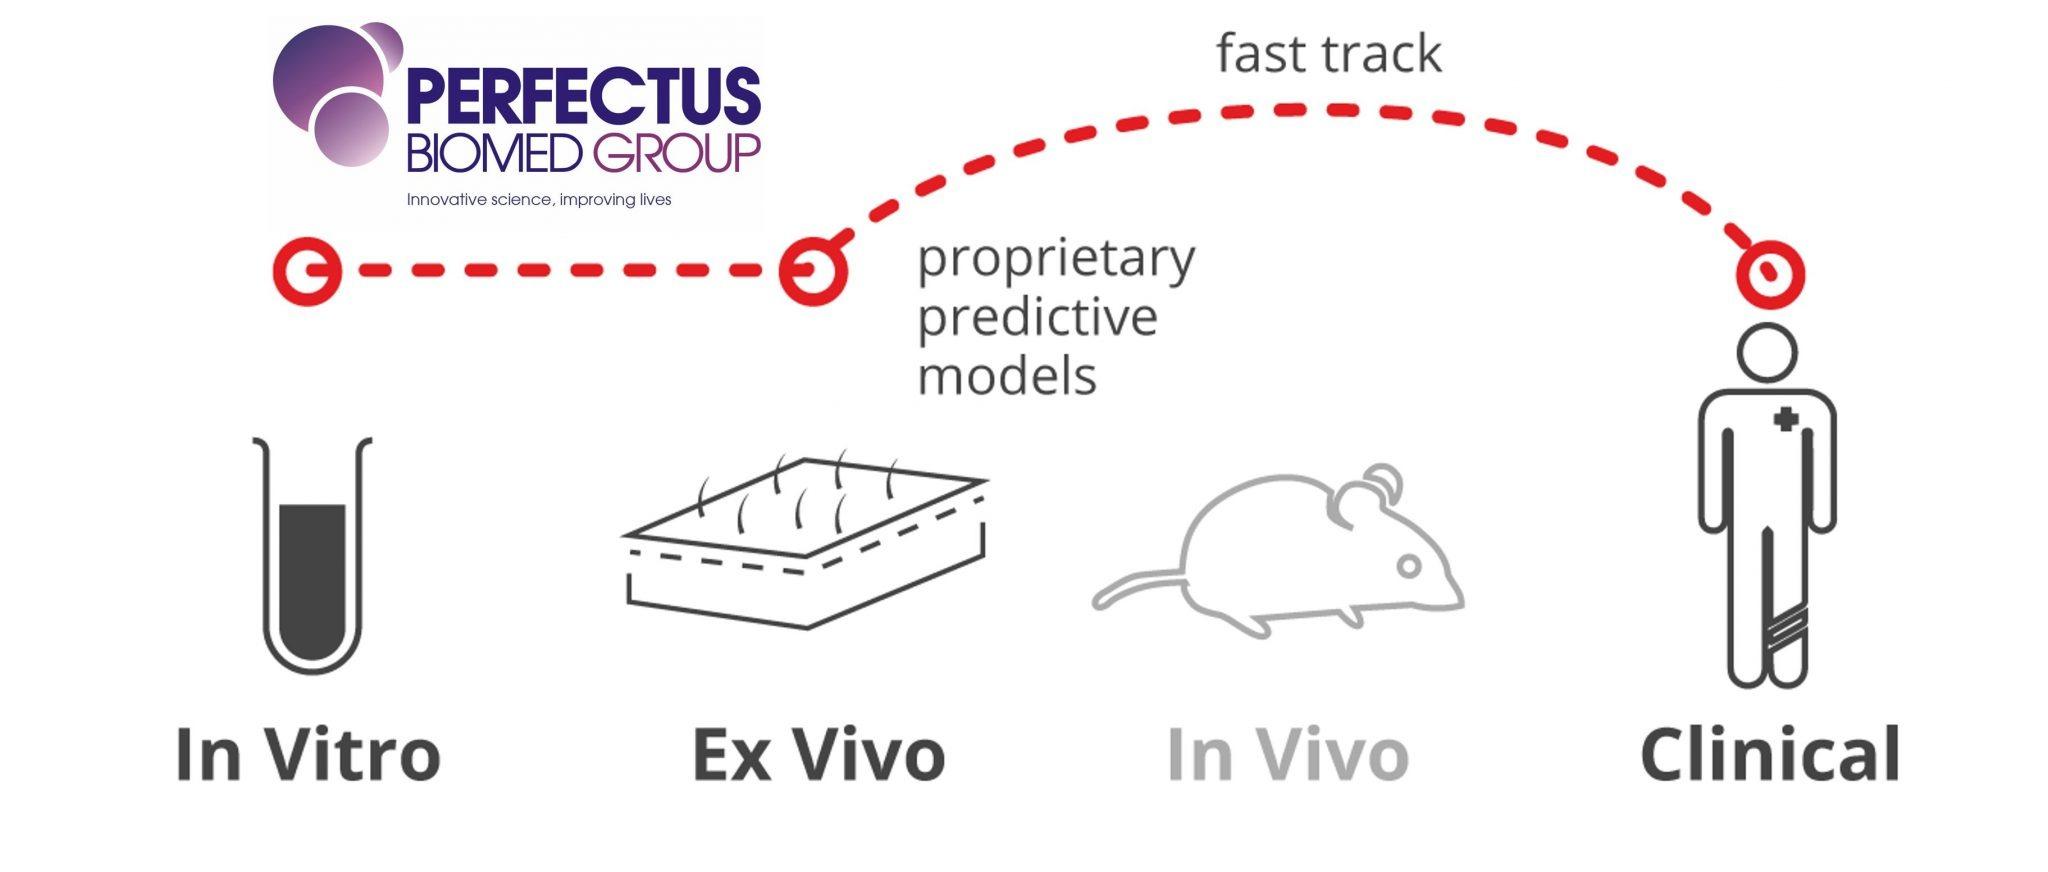 ex vivo and in vitro tissue testing